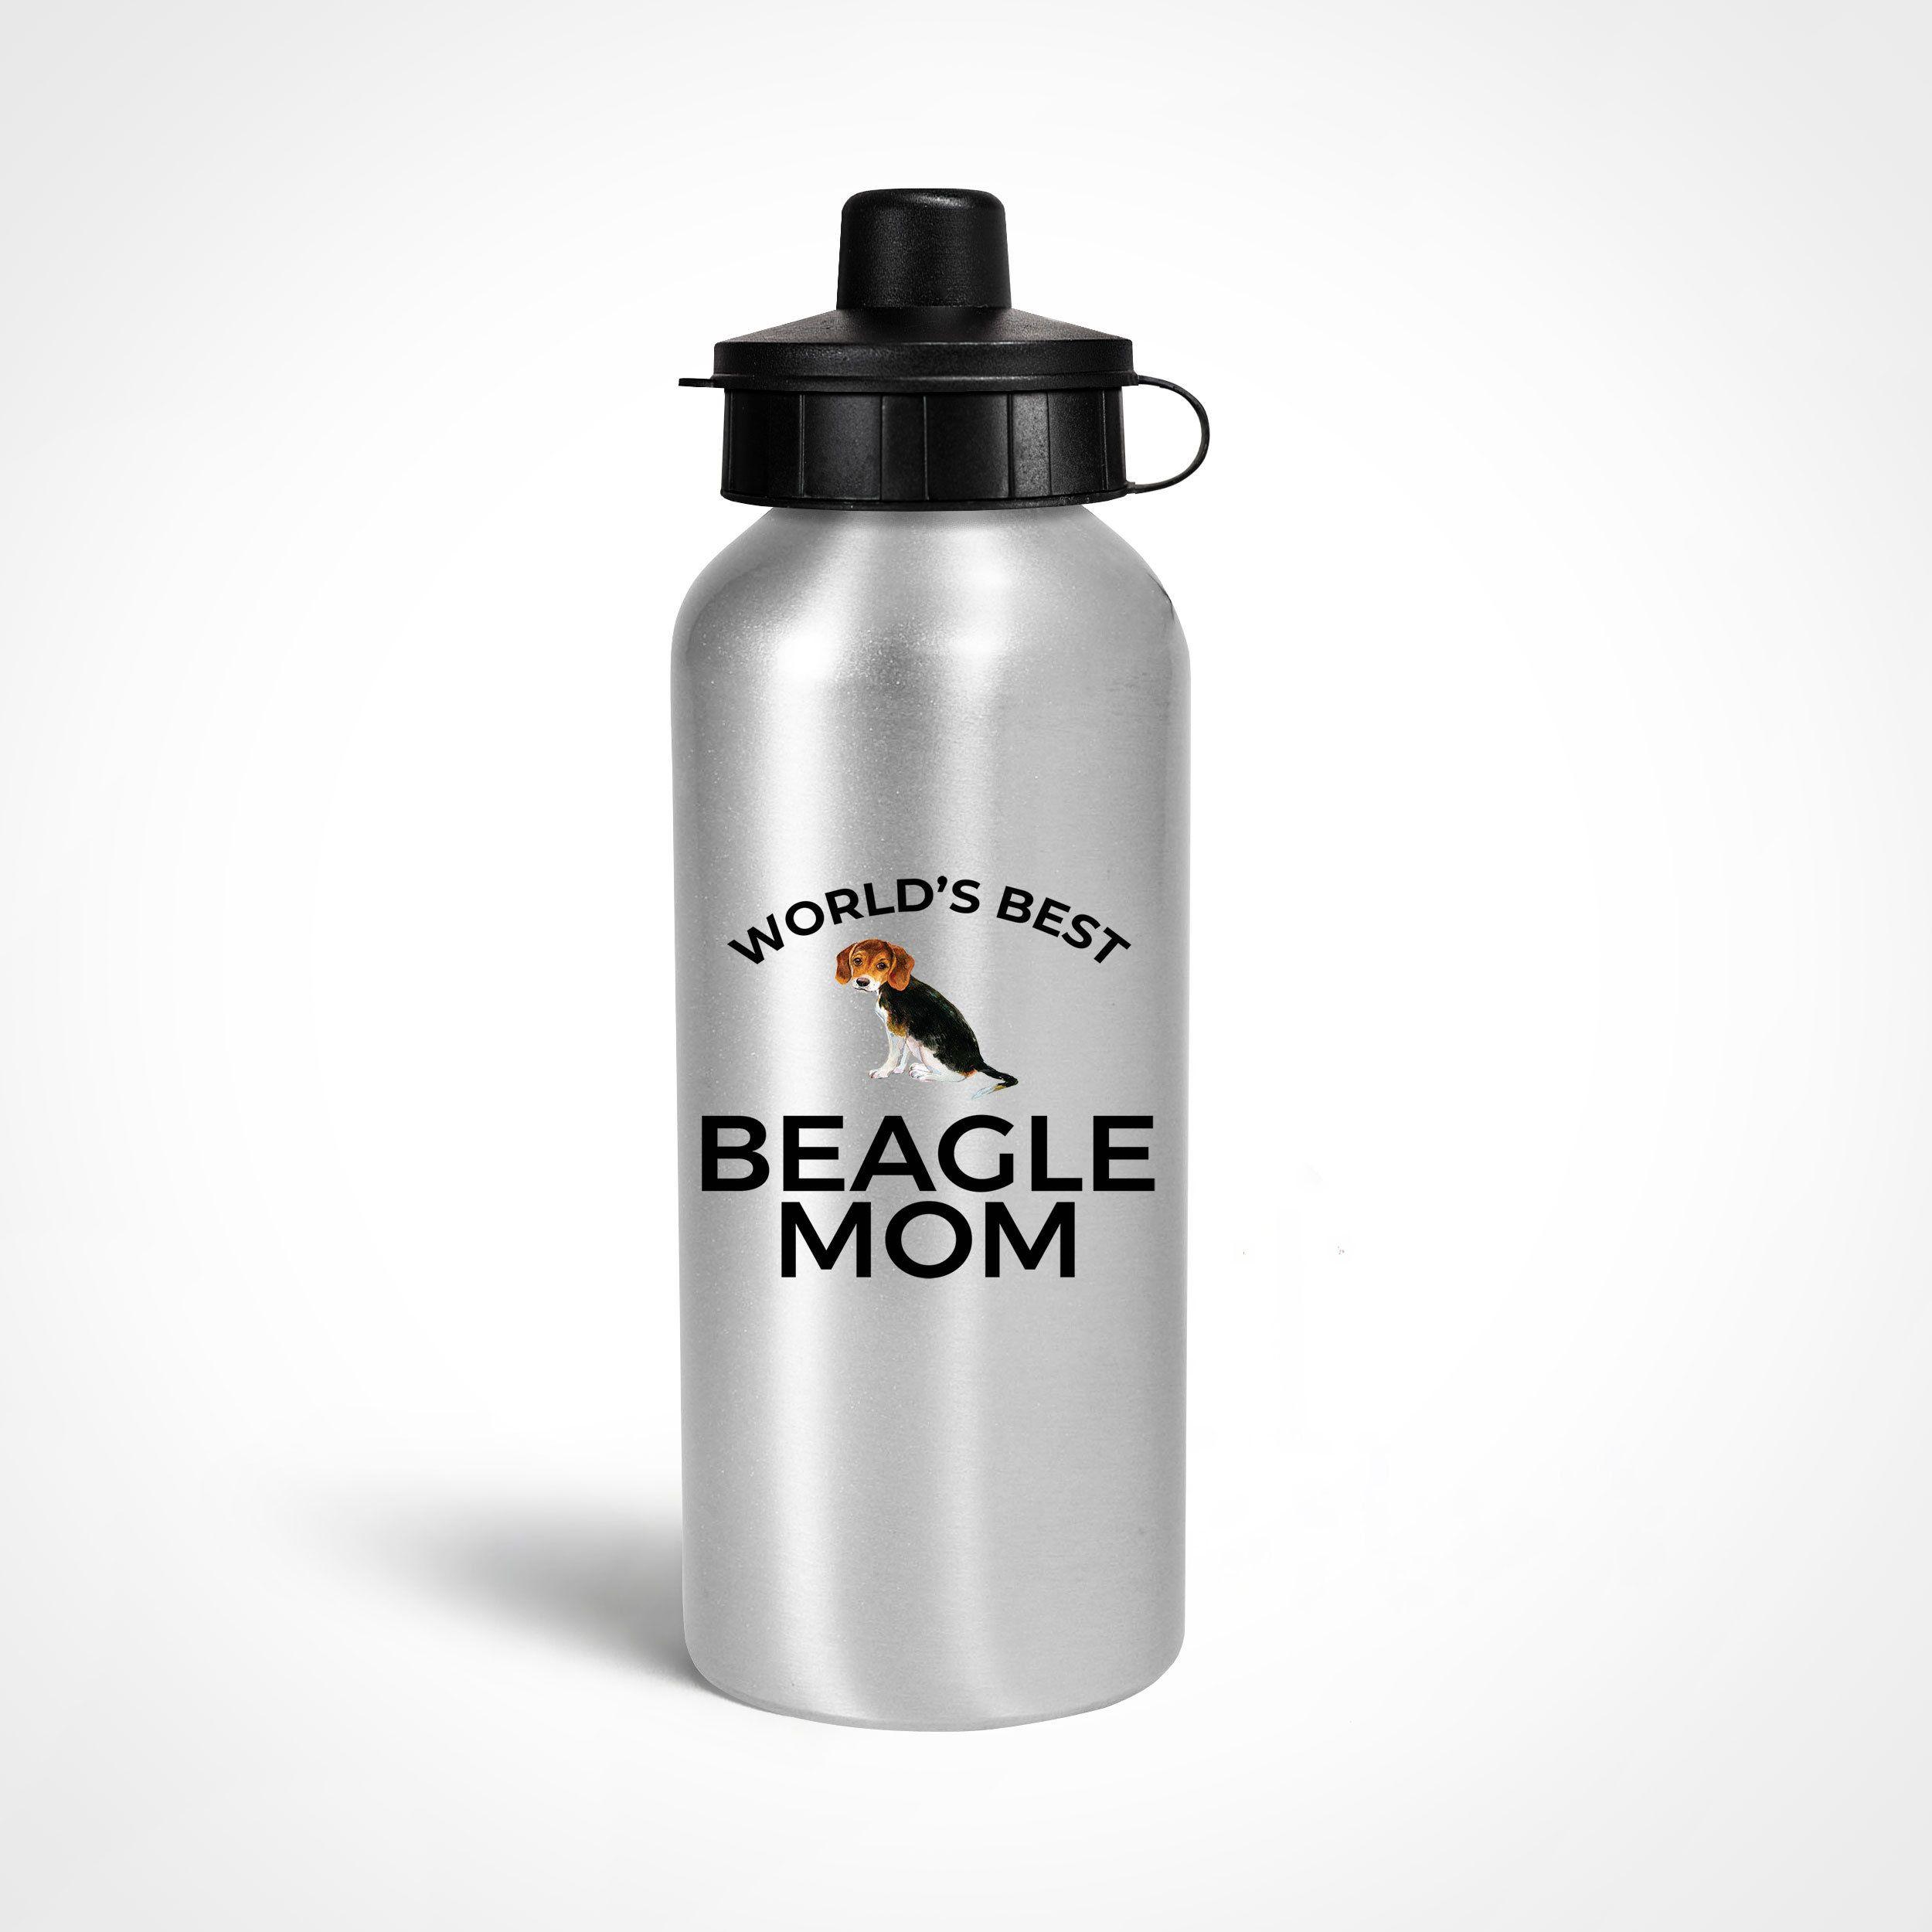 Beagle dog mom water bottle bpafreebottle giftformom